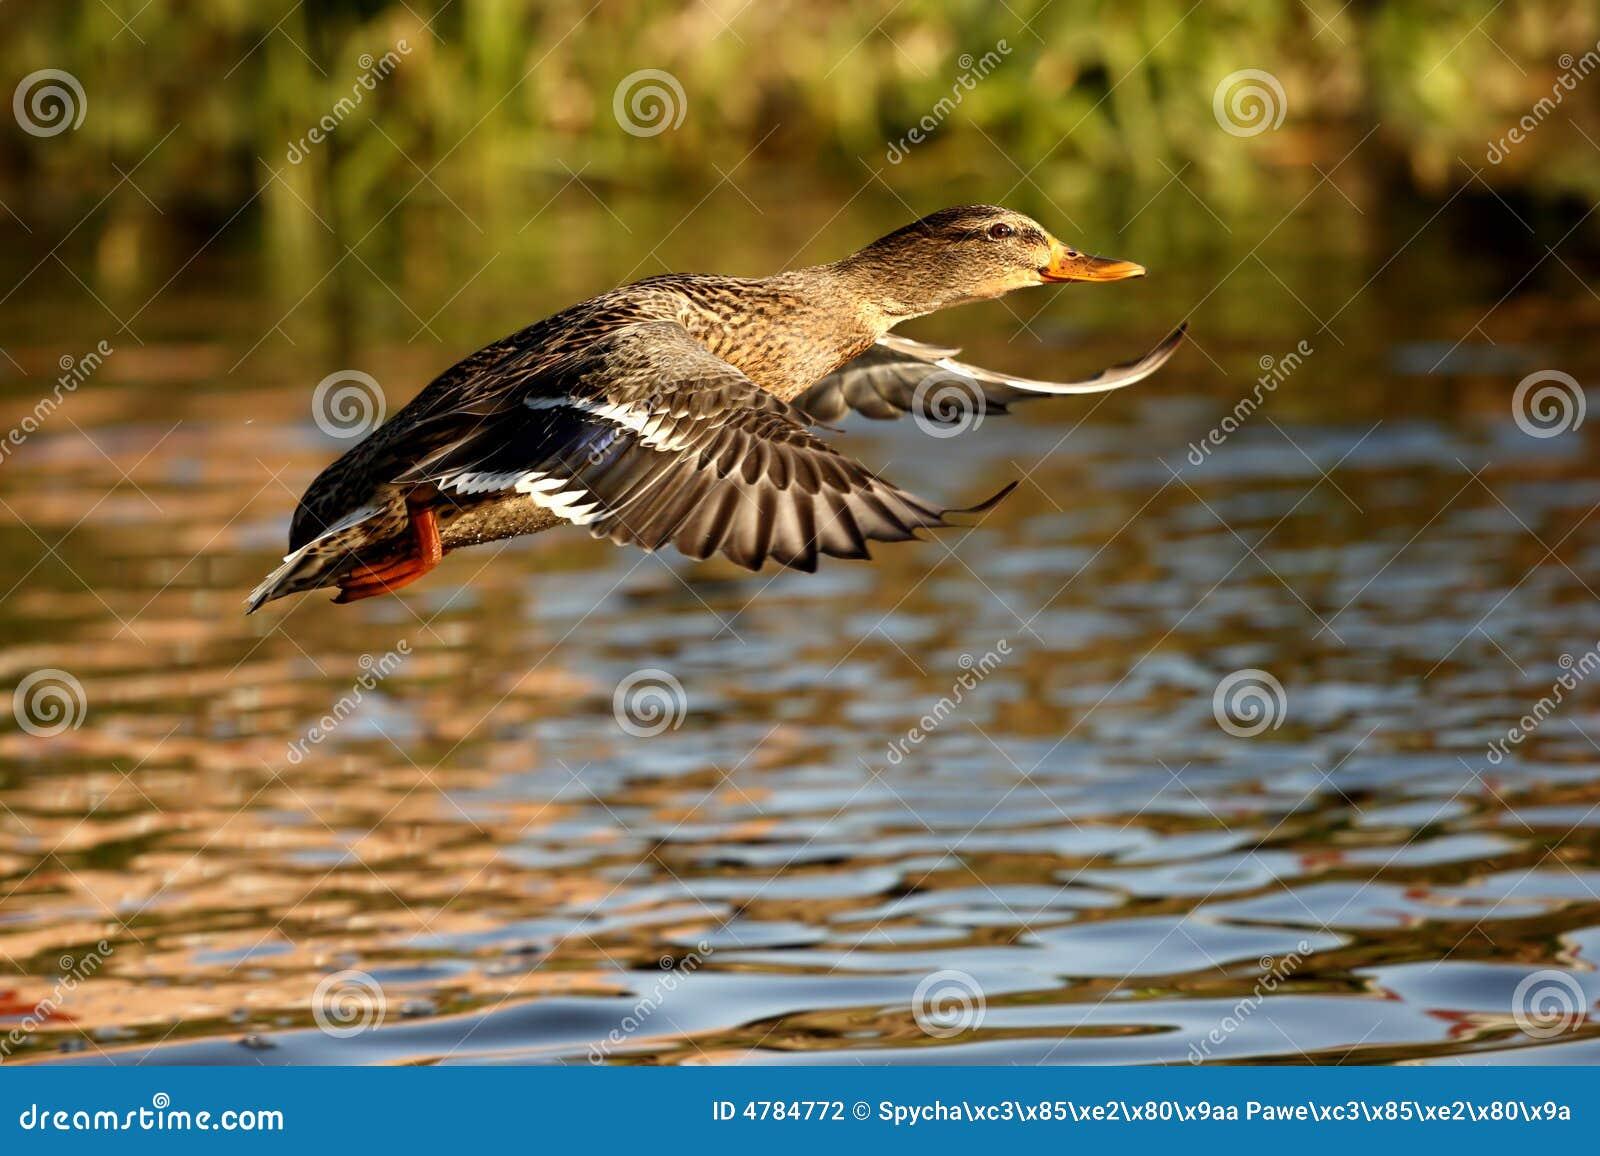 Duck stock photo. Image of camera, safari, bird, wild - 4784772